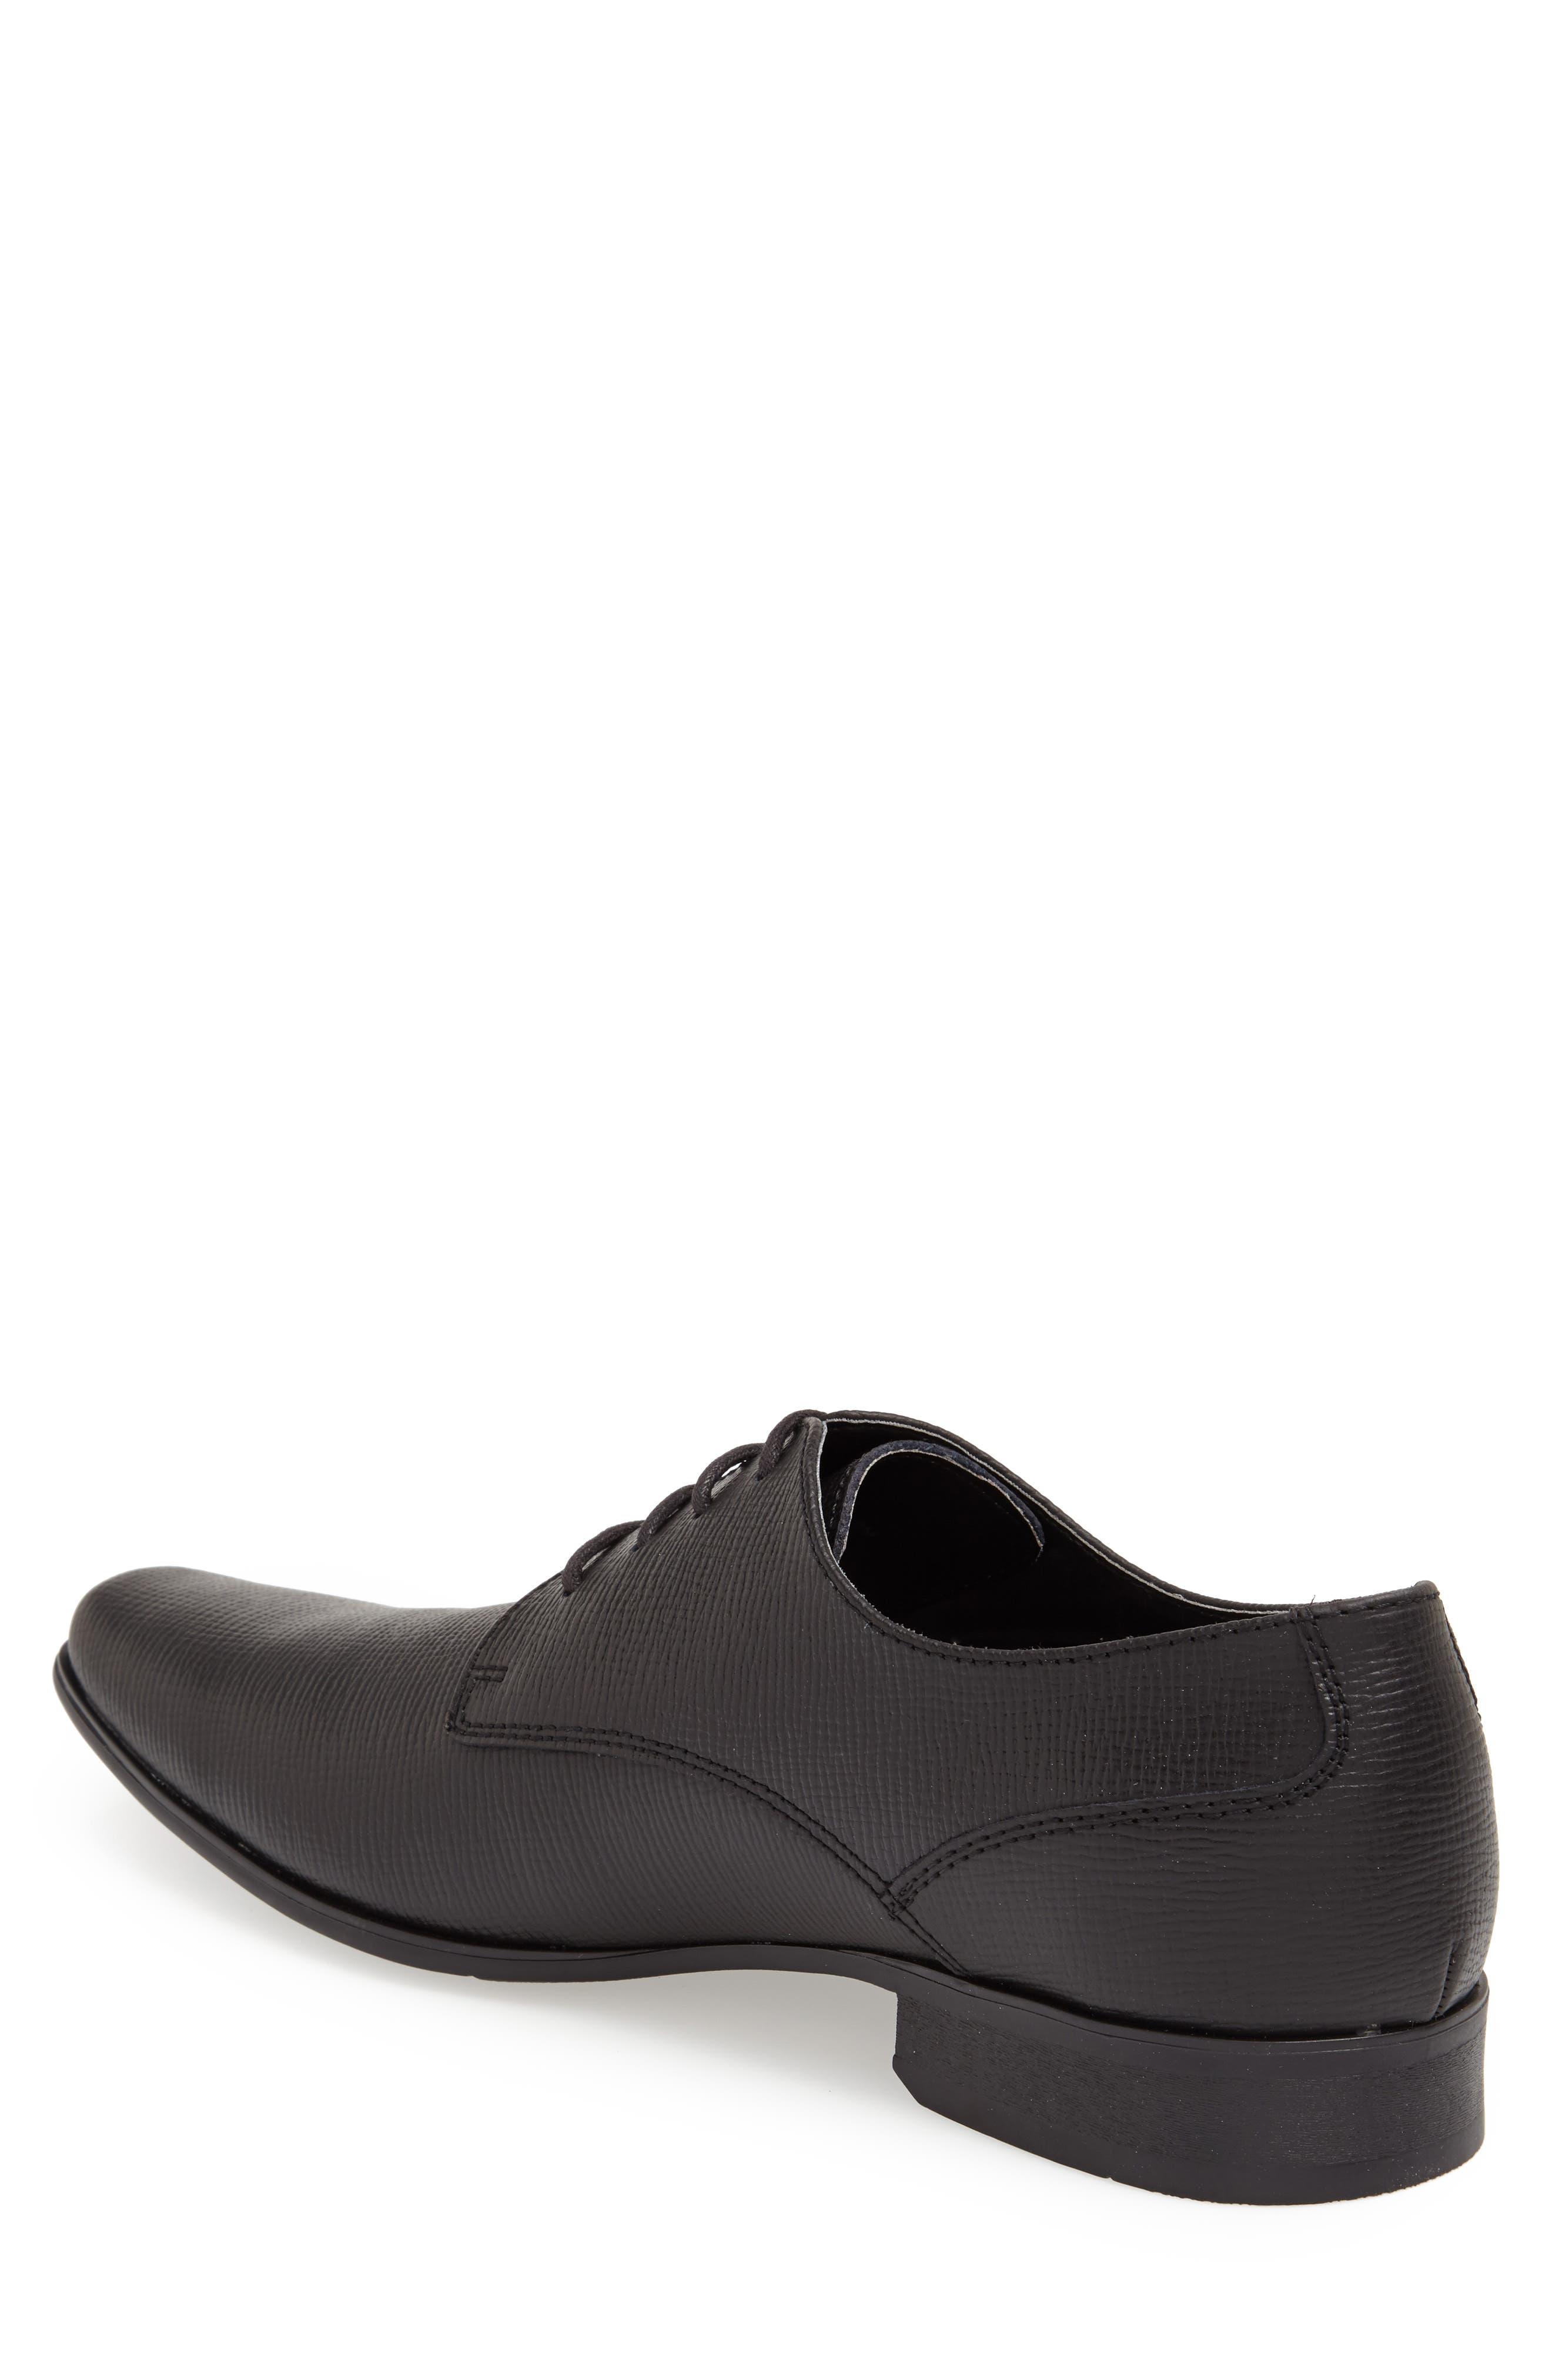 'Brodie' Plain Toe Derby,                             Alternate thumbnail 6, color,                             BLACK